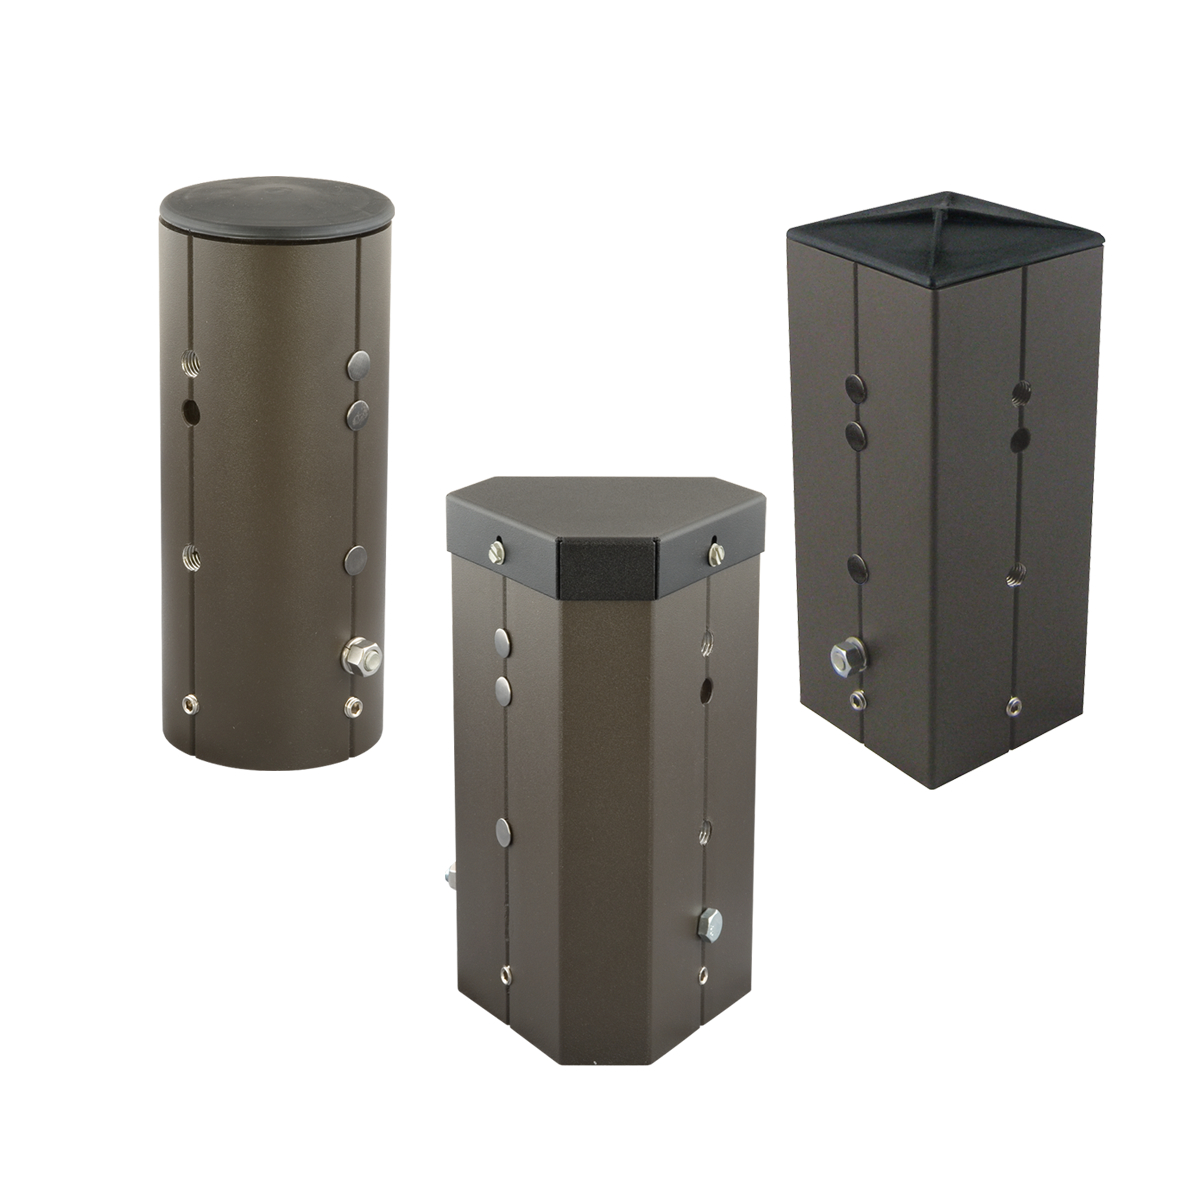 Hubbell® Outdoor LightingSSS-T4-DB